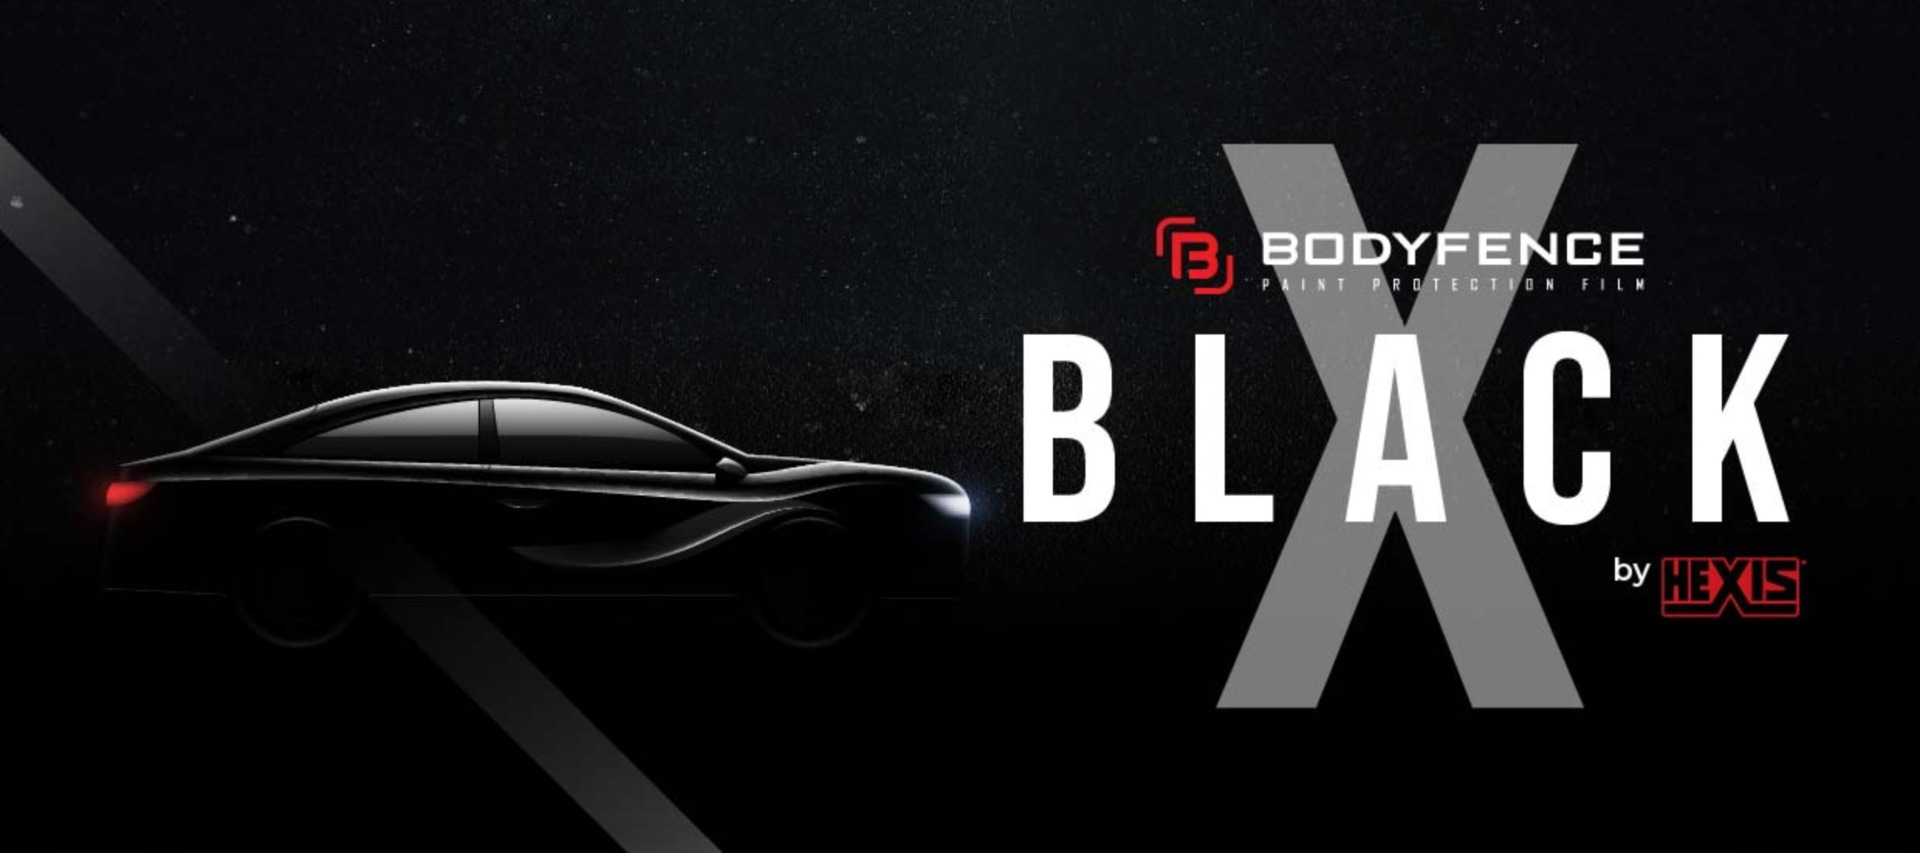 Bodyfence Black